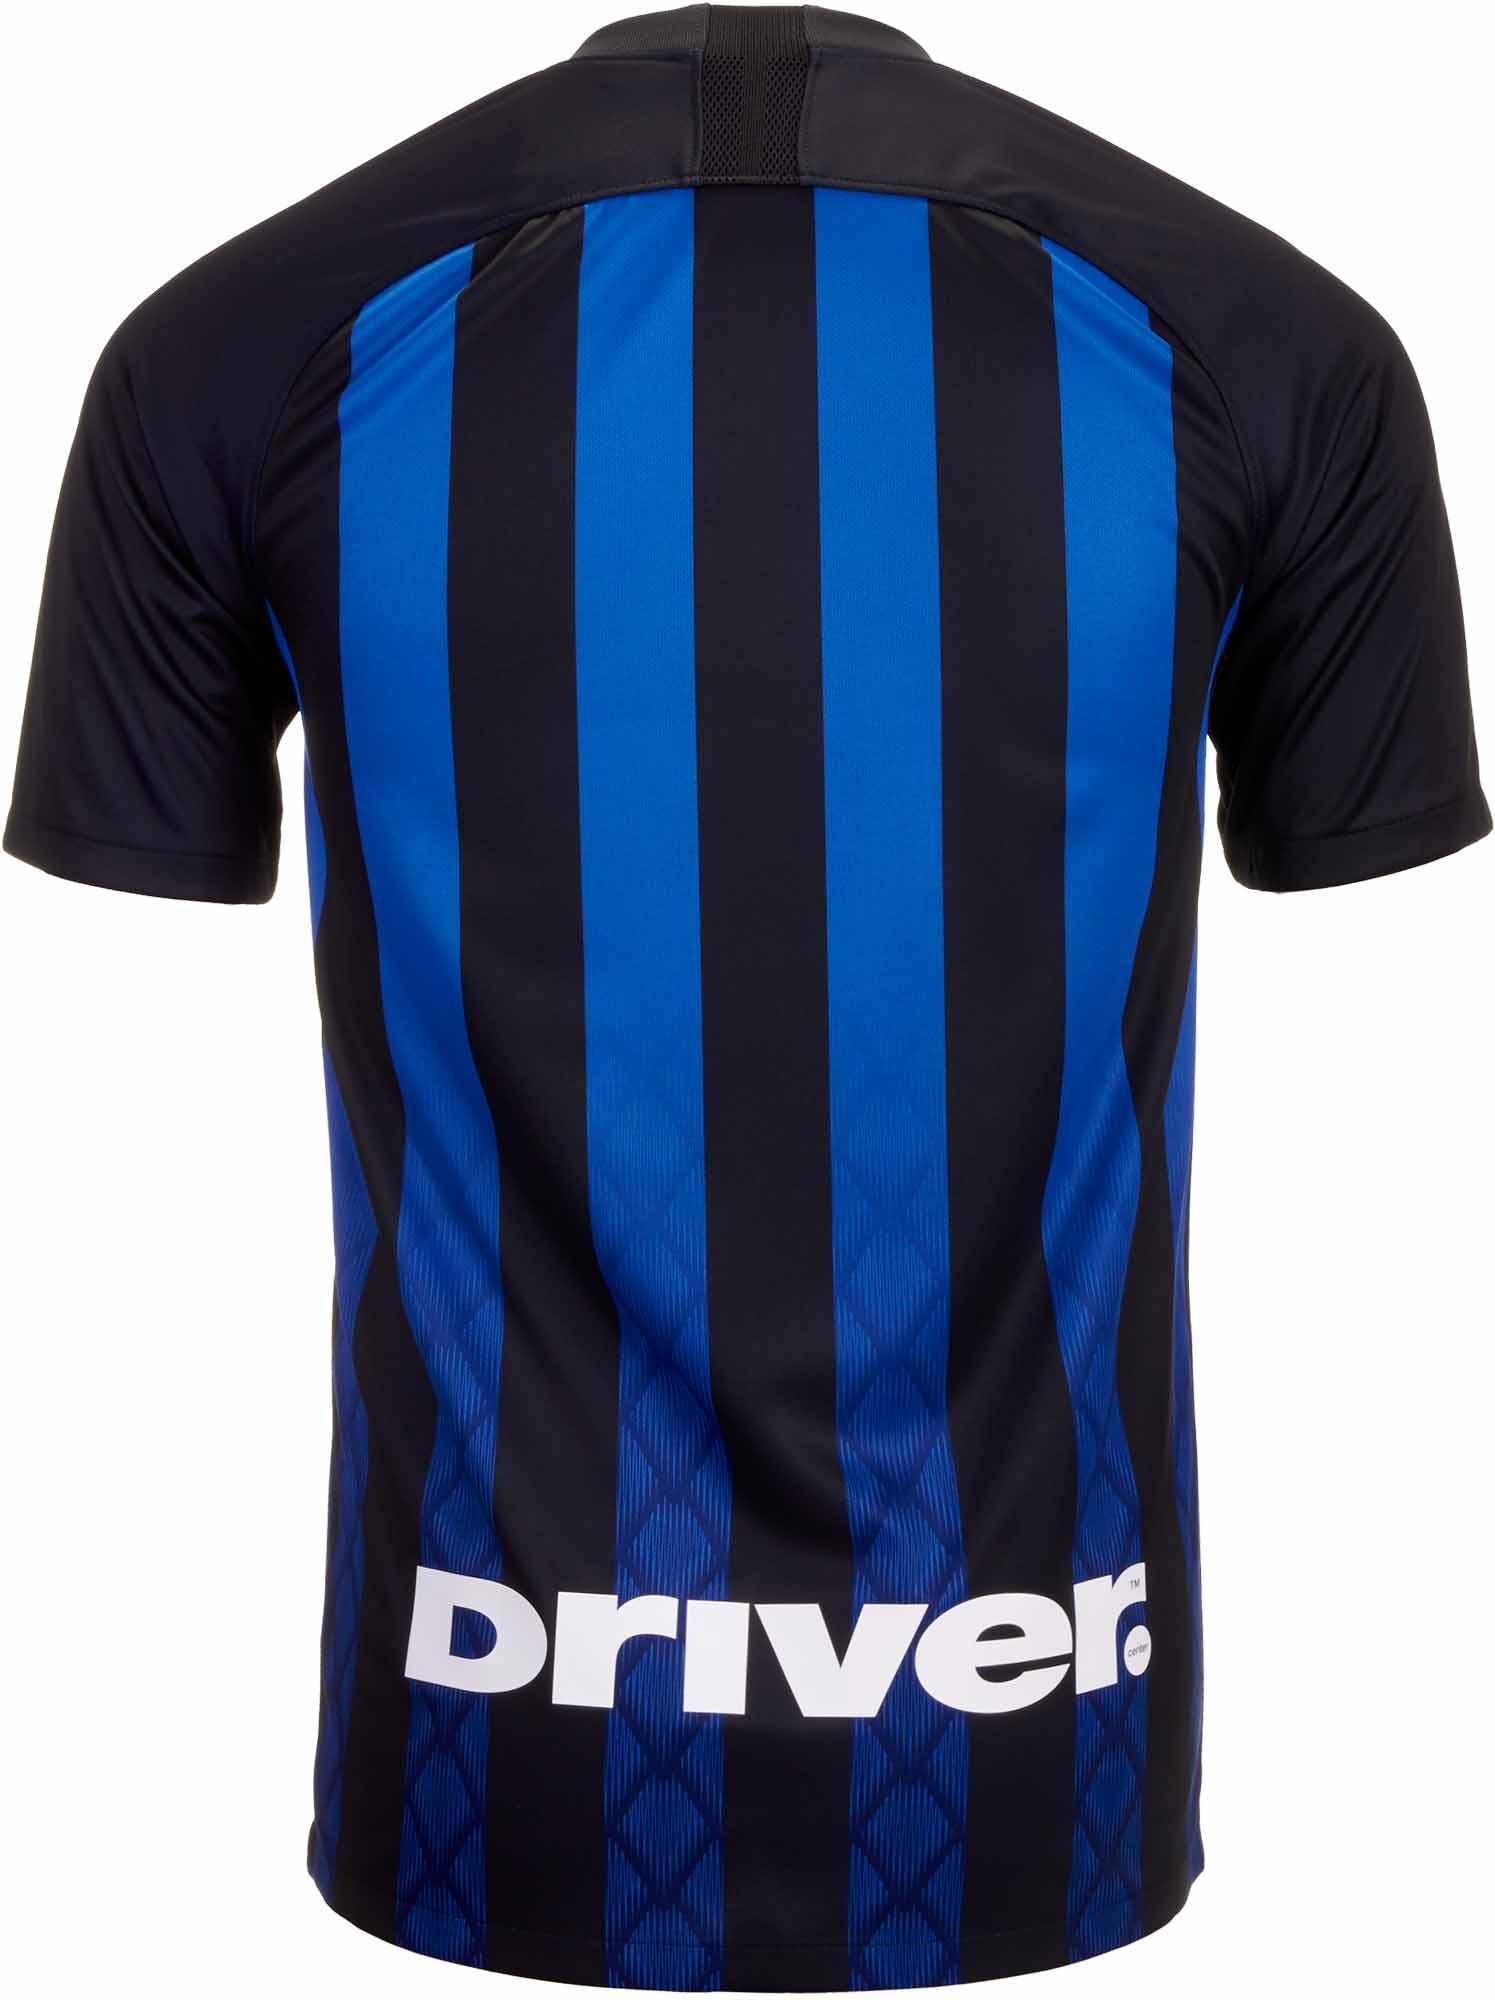 newest 0210d b98ee Nike Inter Milan Home Jersey 2018-19 - SoccerPro